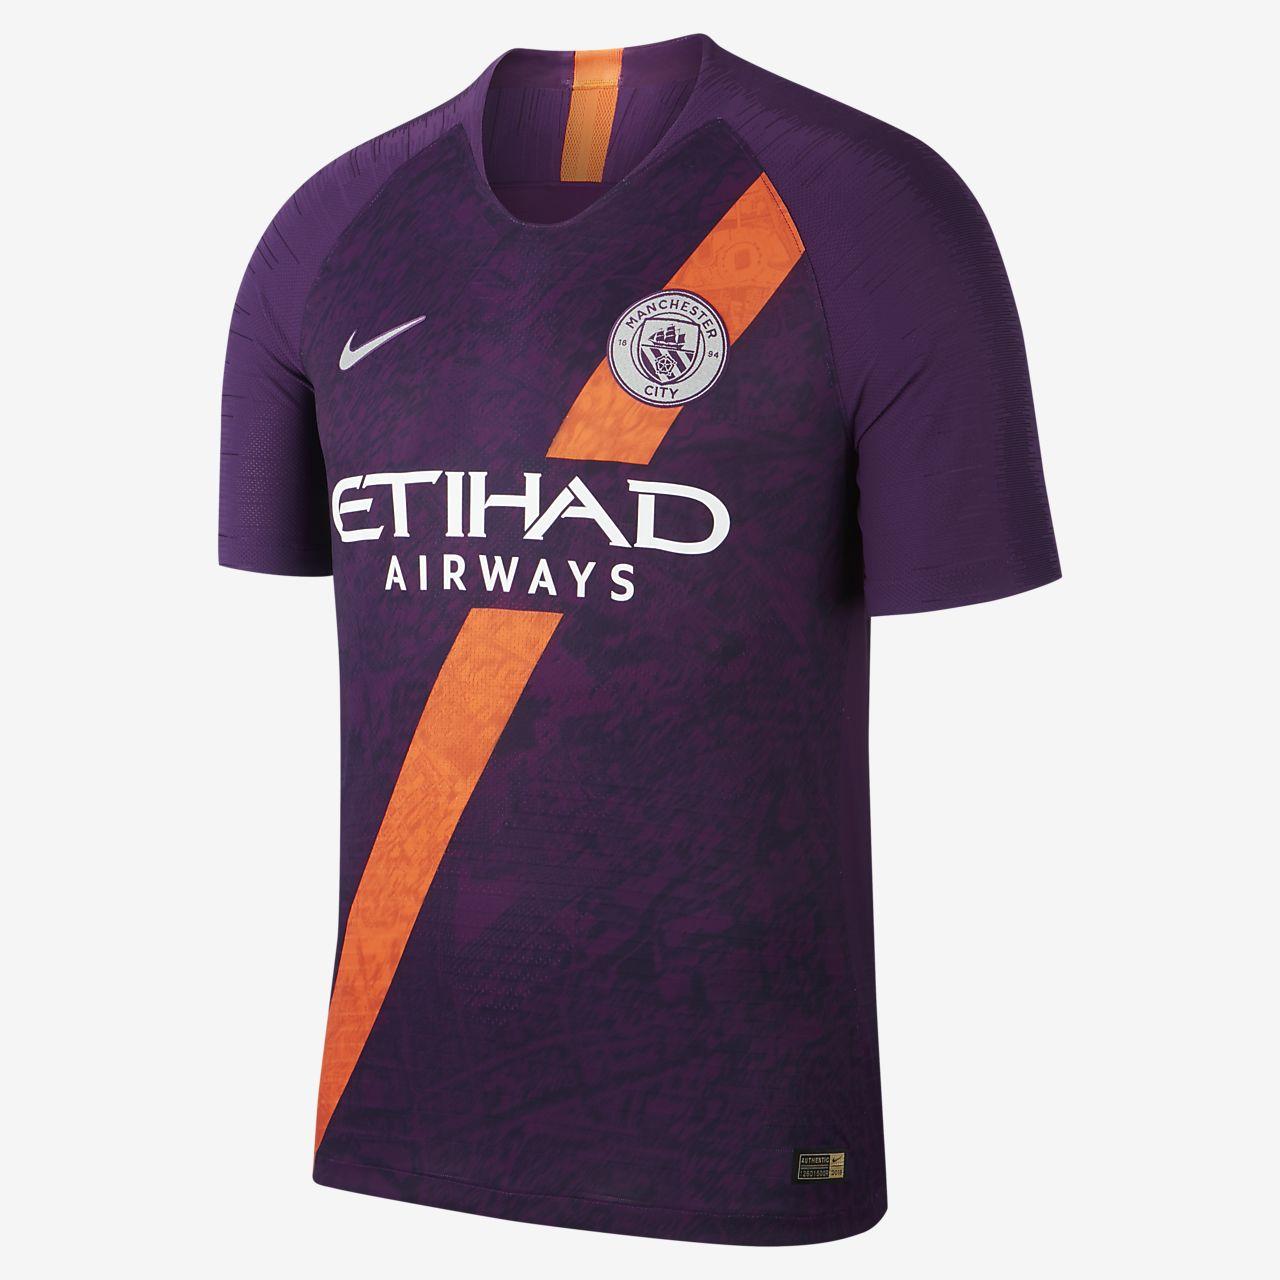 2018/19 Manchester City FC Vapor Match Third fotballdrakt til herre